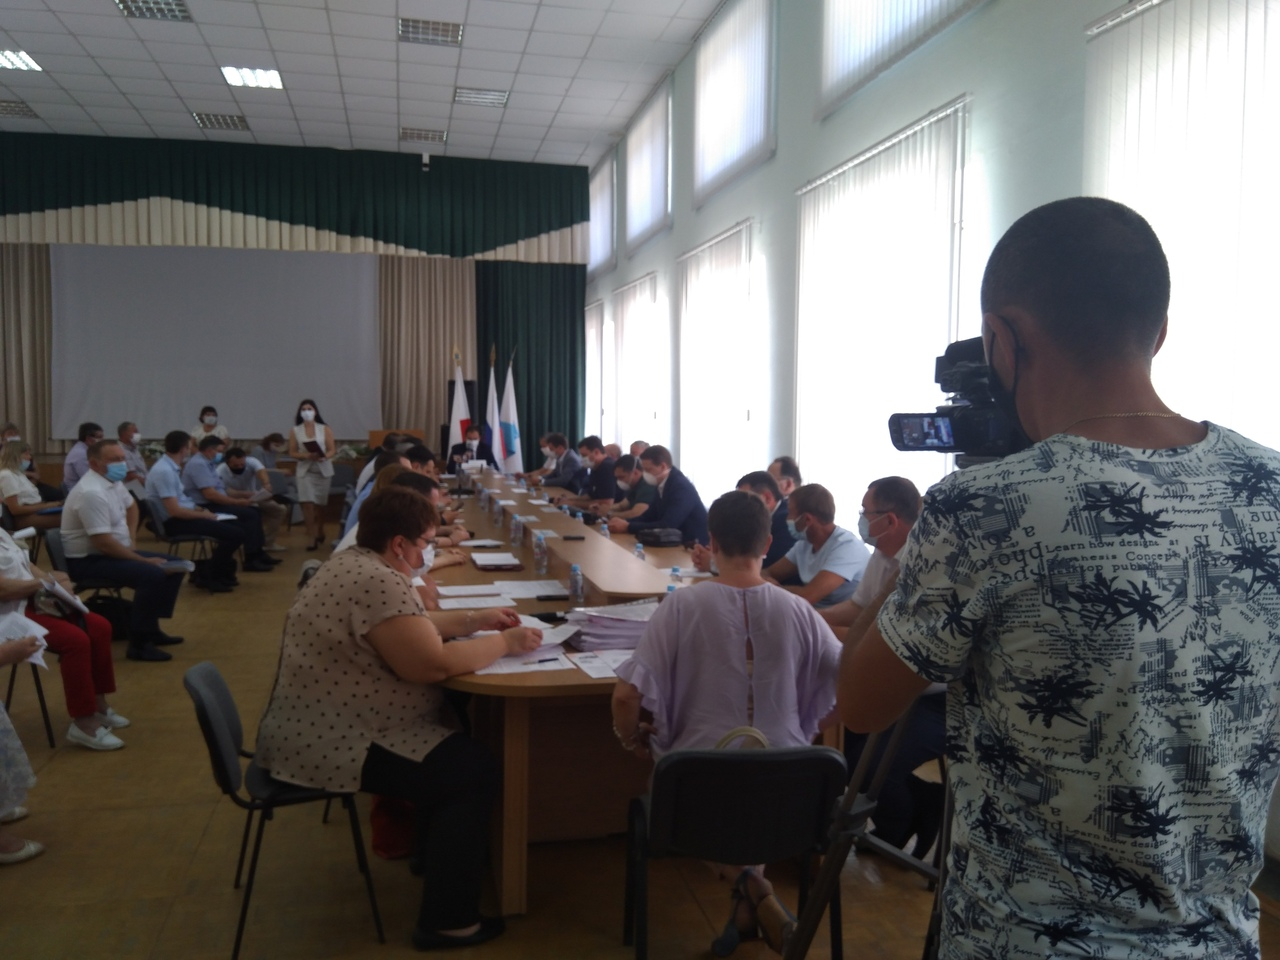 Конфликт между сотрудниками и руководством предприятия «Саратовгорэлектротранс»